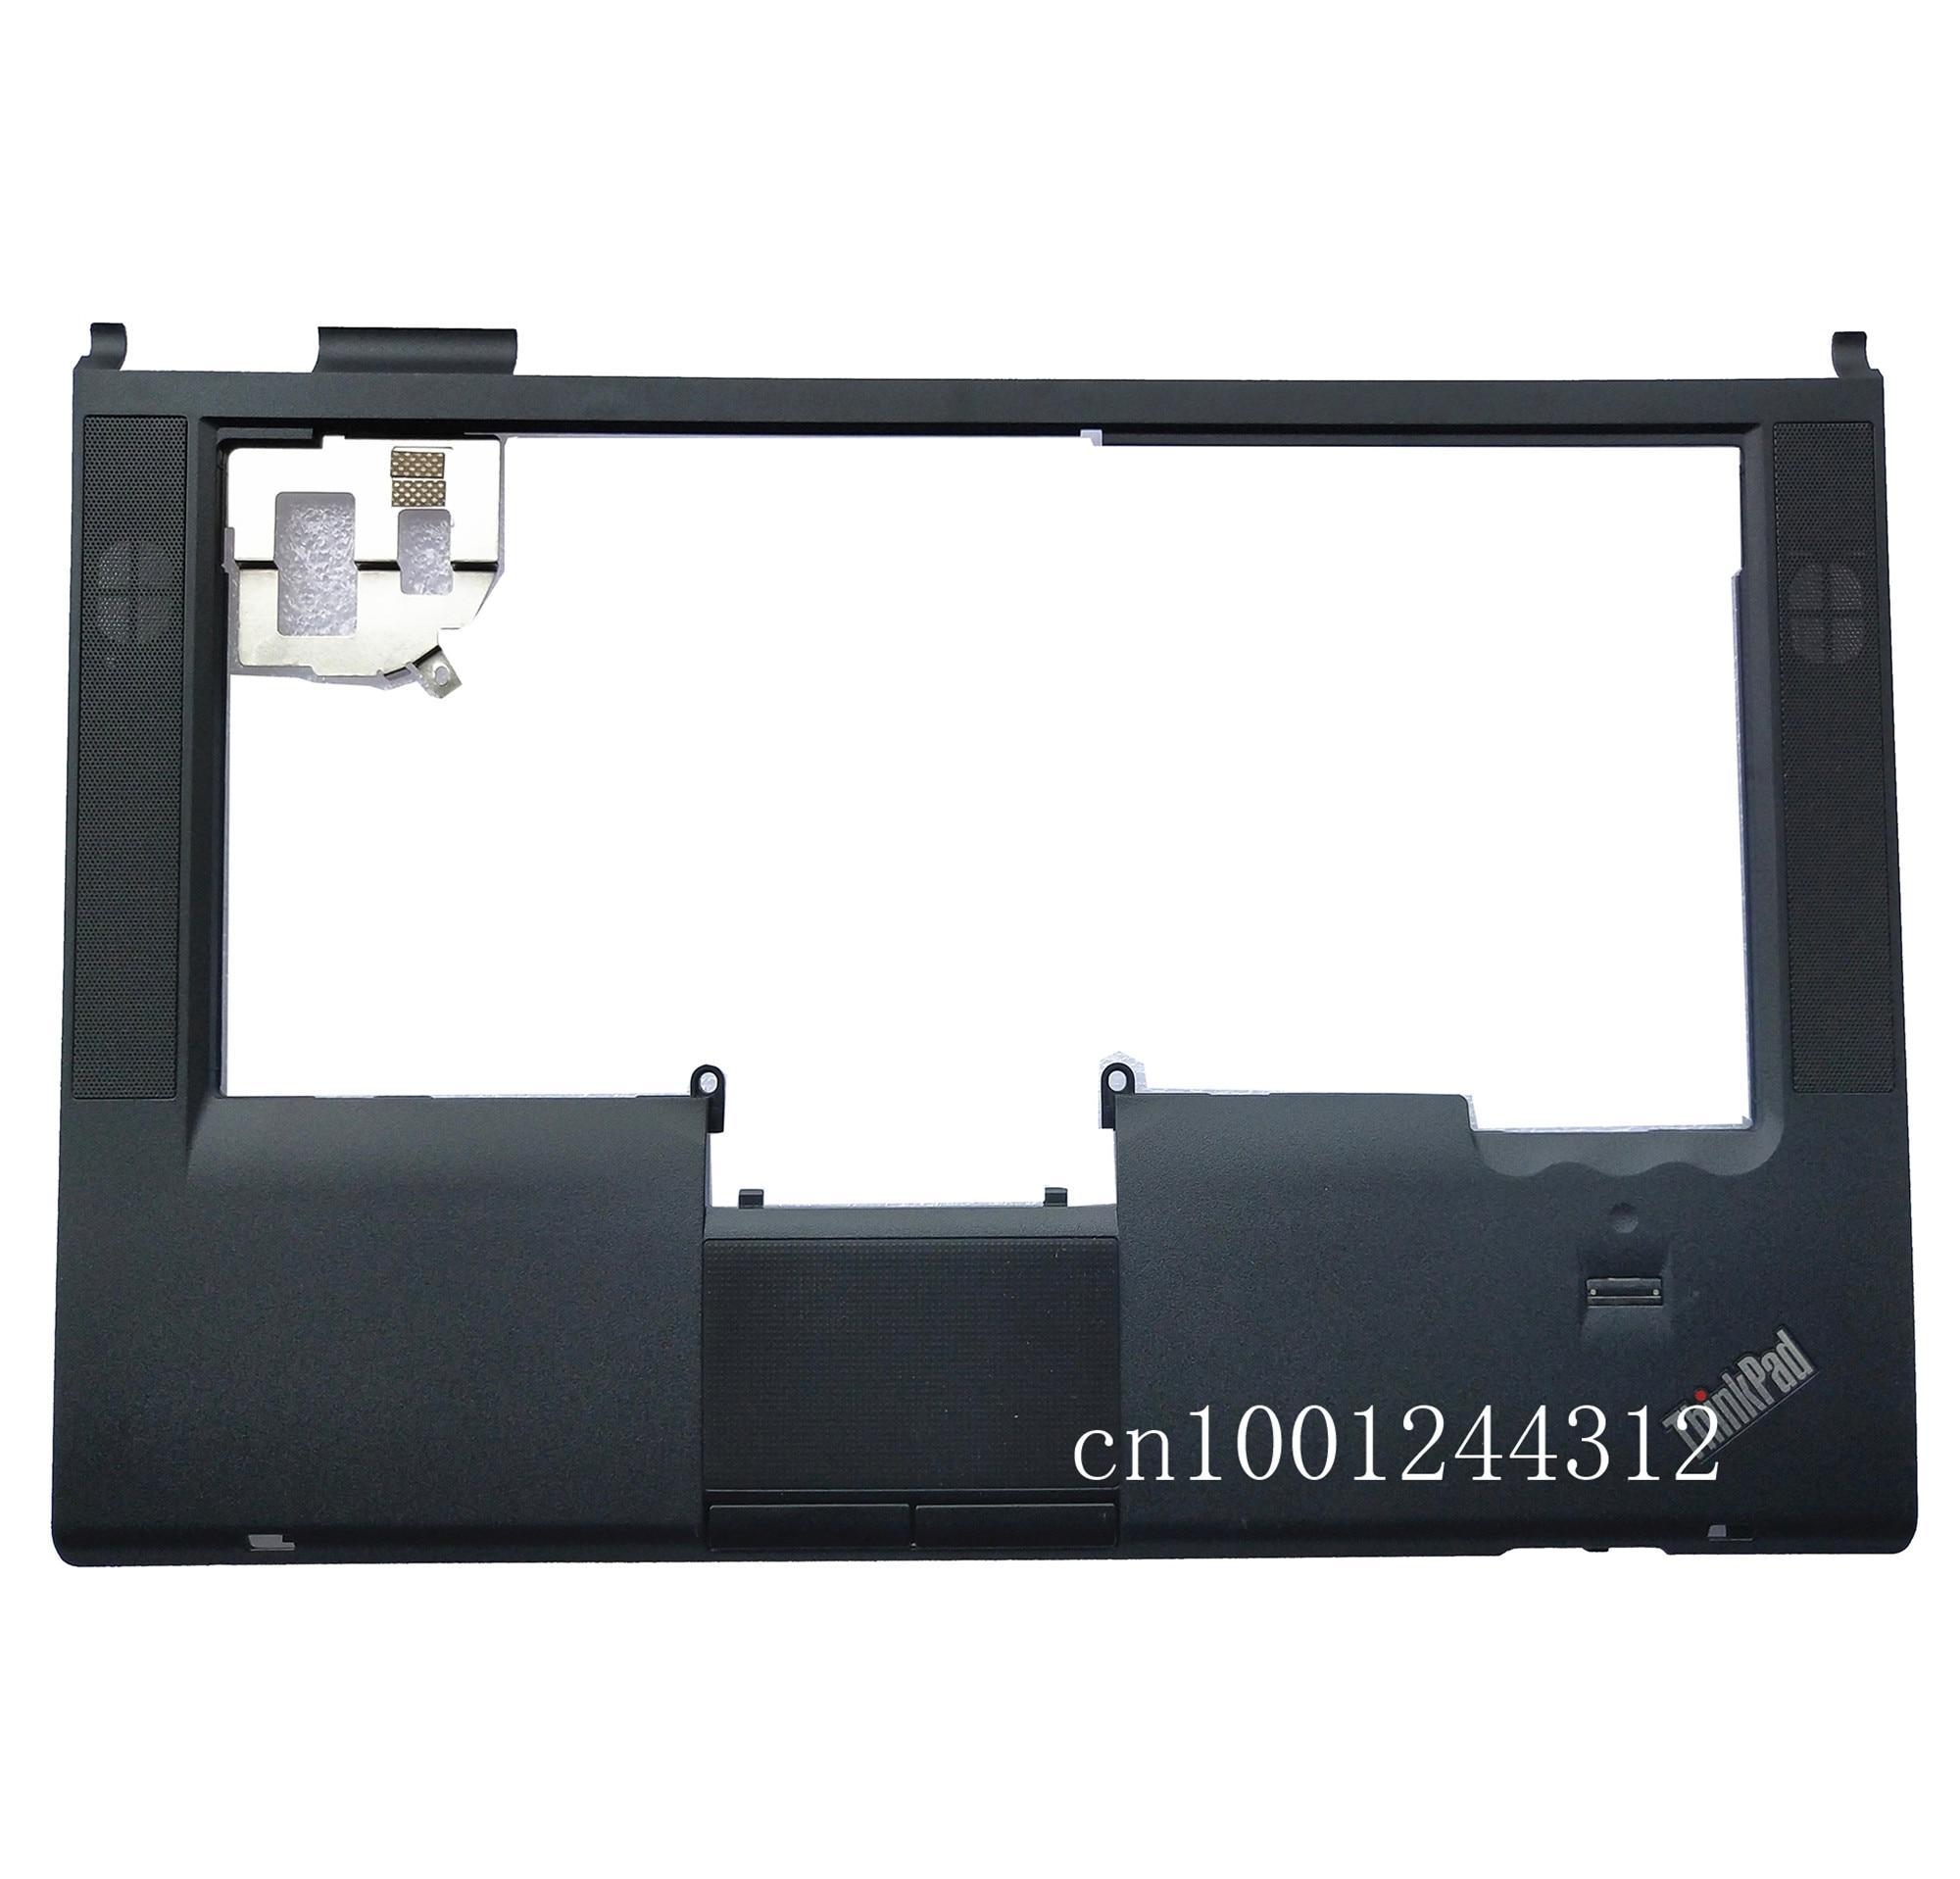 Thinkpad T510 W510 T520 W520 Touchpad Cover Bezel Palmrest Laptop Repair Part